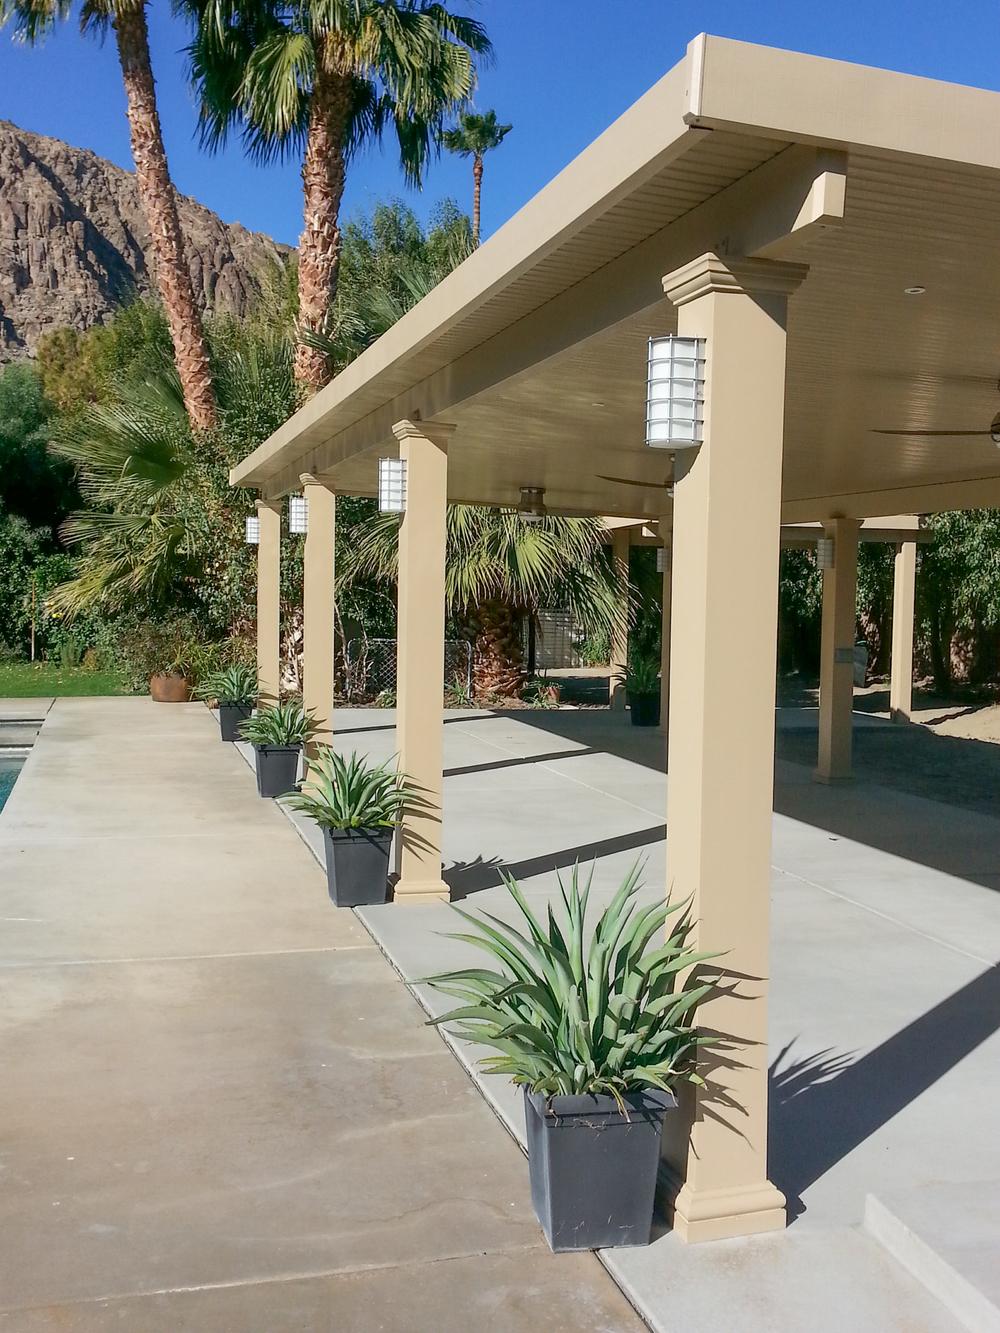 Custom Outdoor Lighting With 8 Inch Square Columns, La Quinta, CA